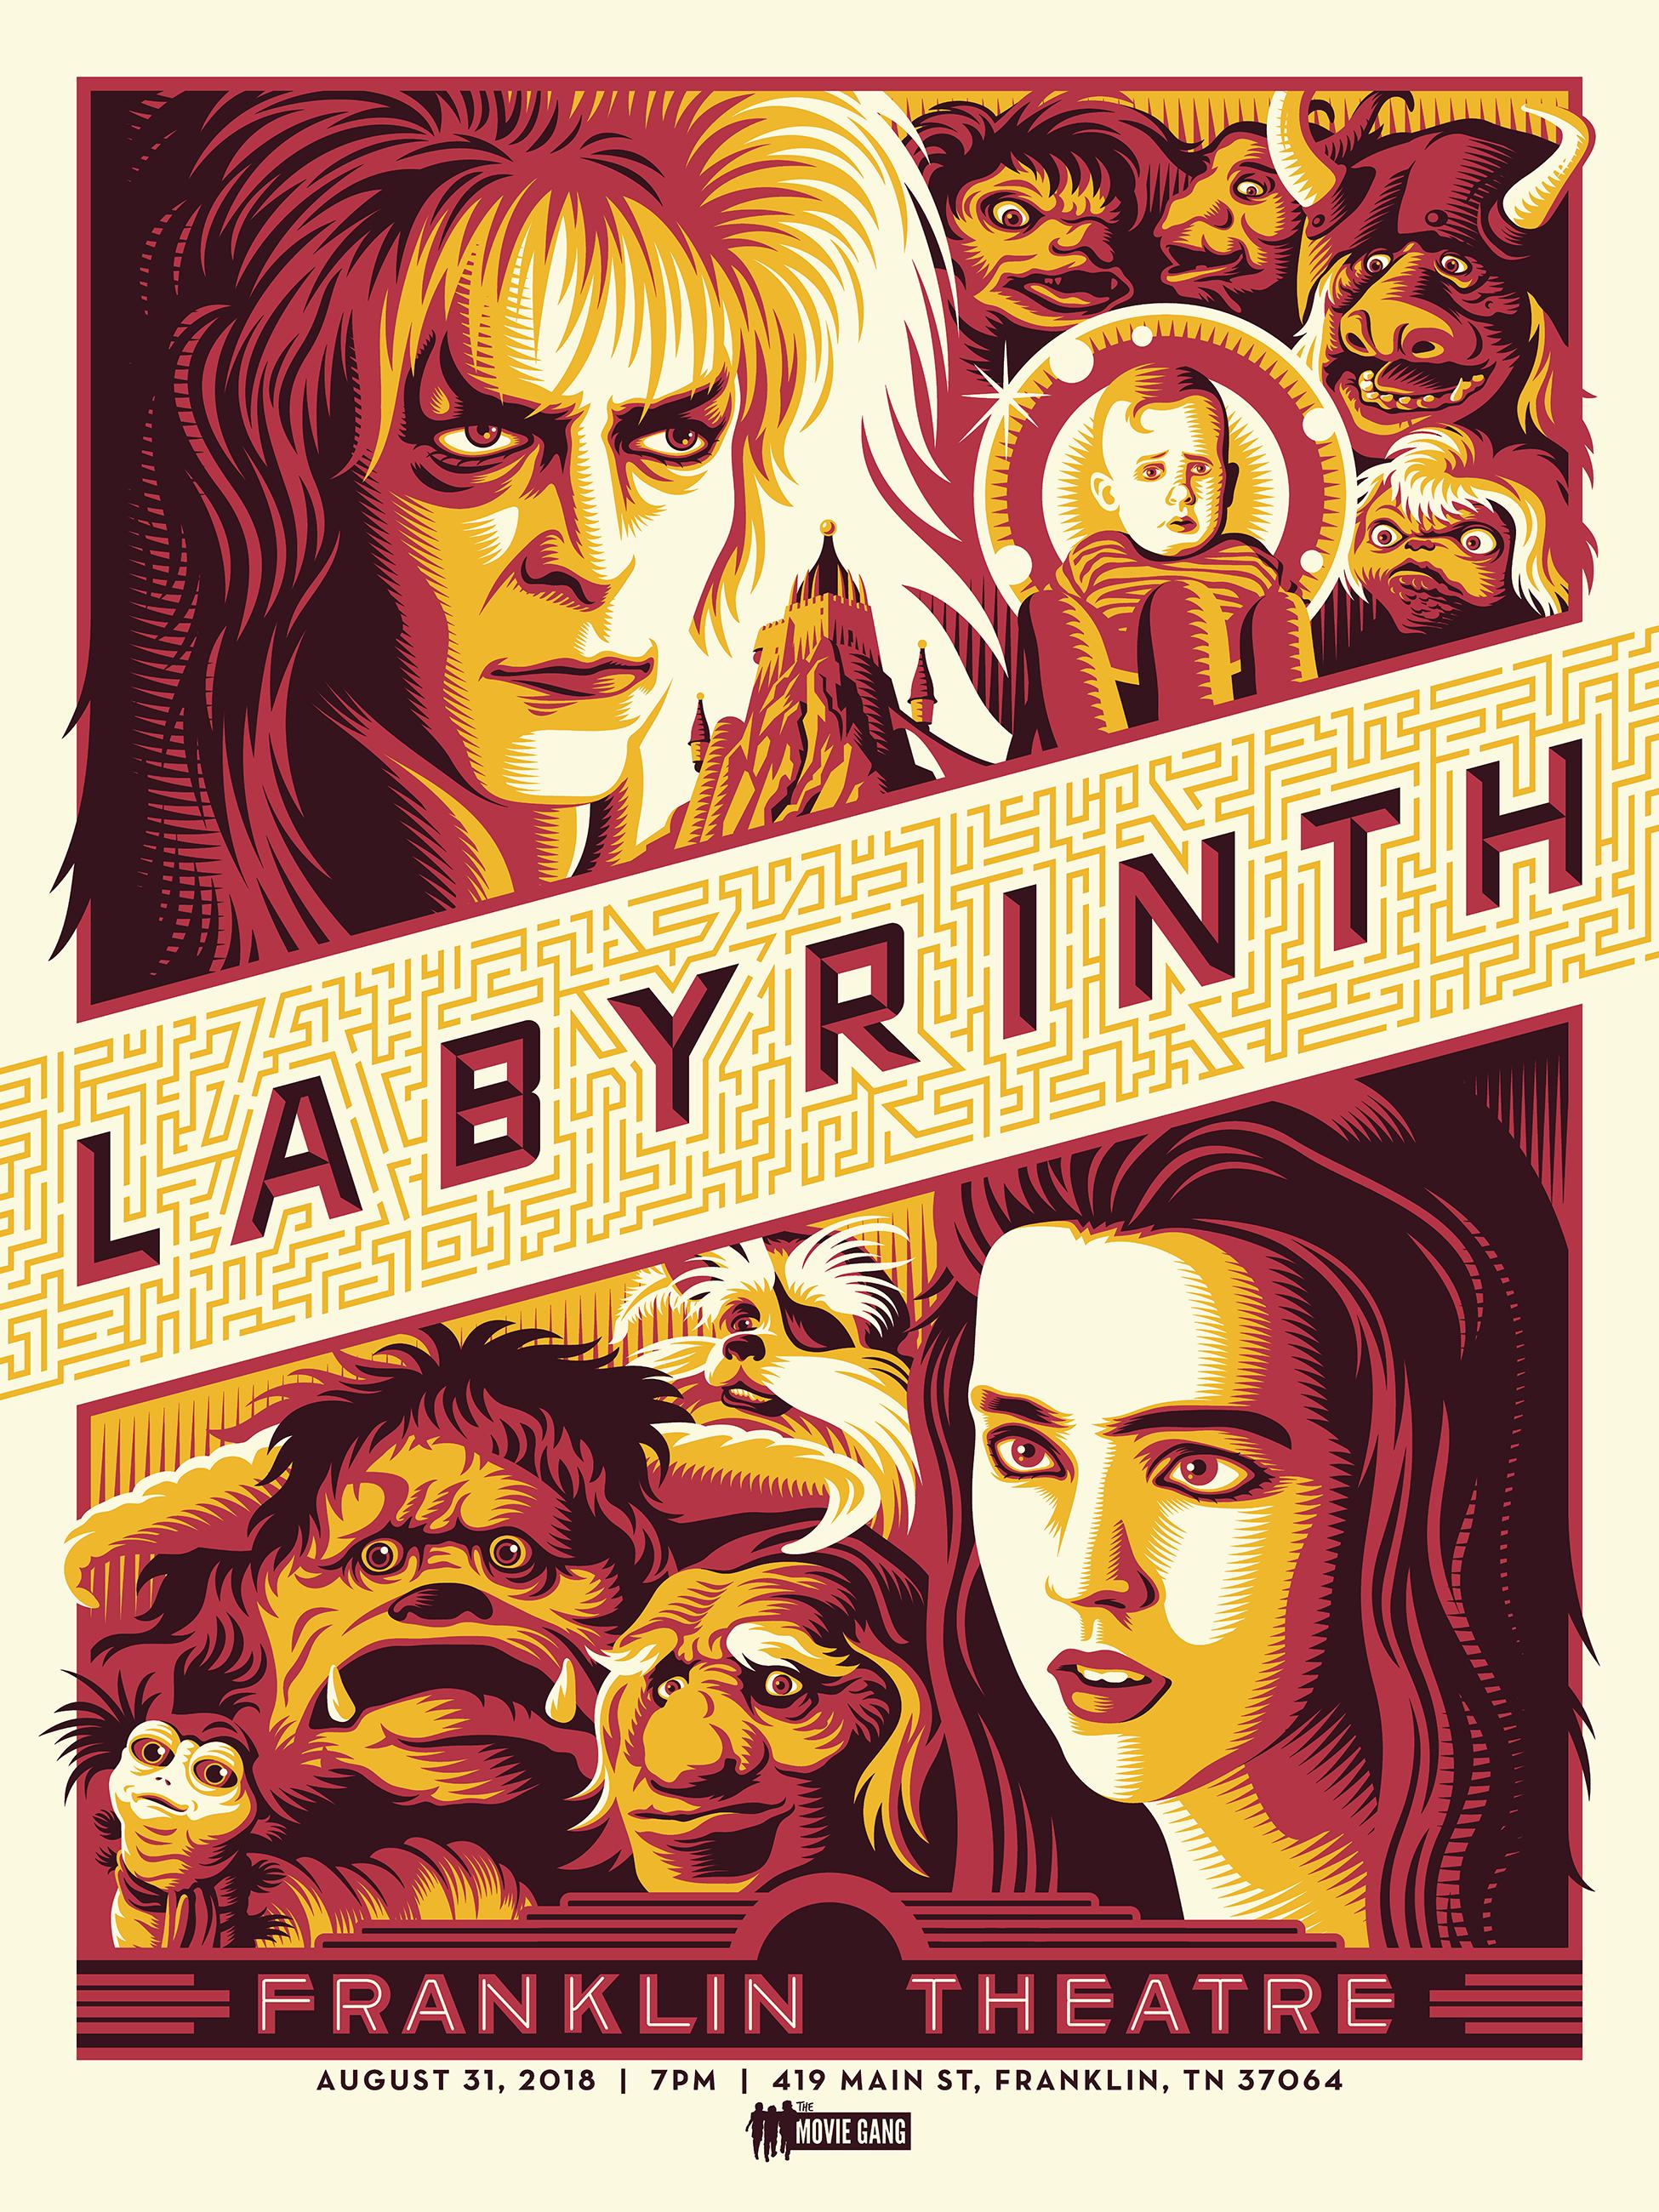 labyrinth_ref.jpg